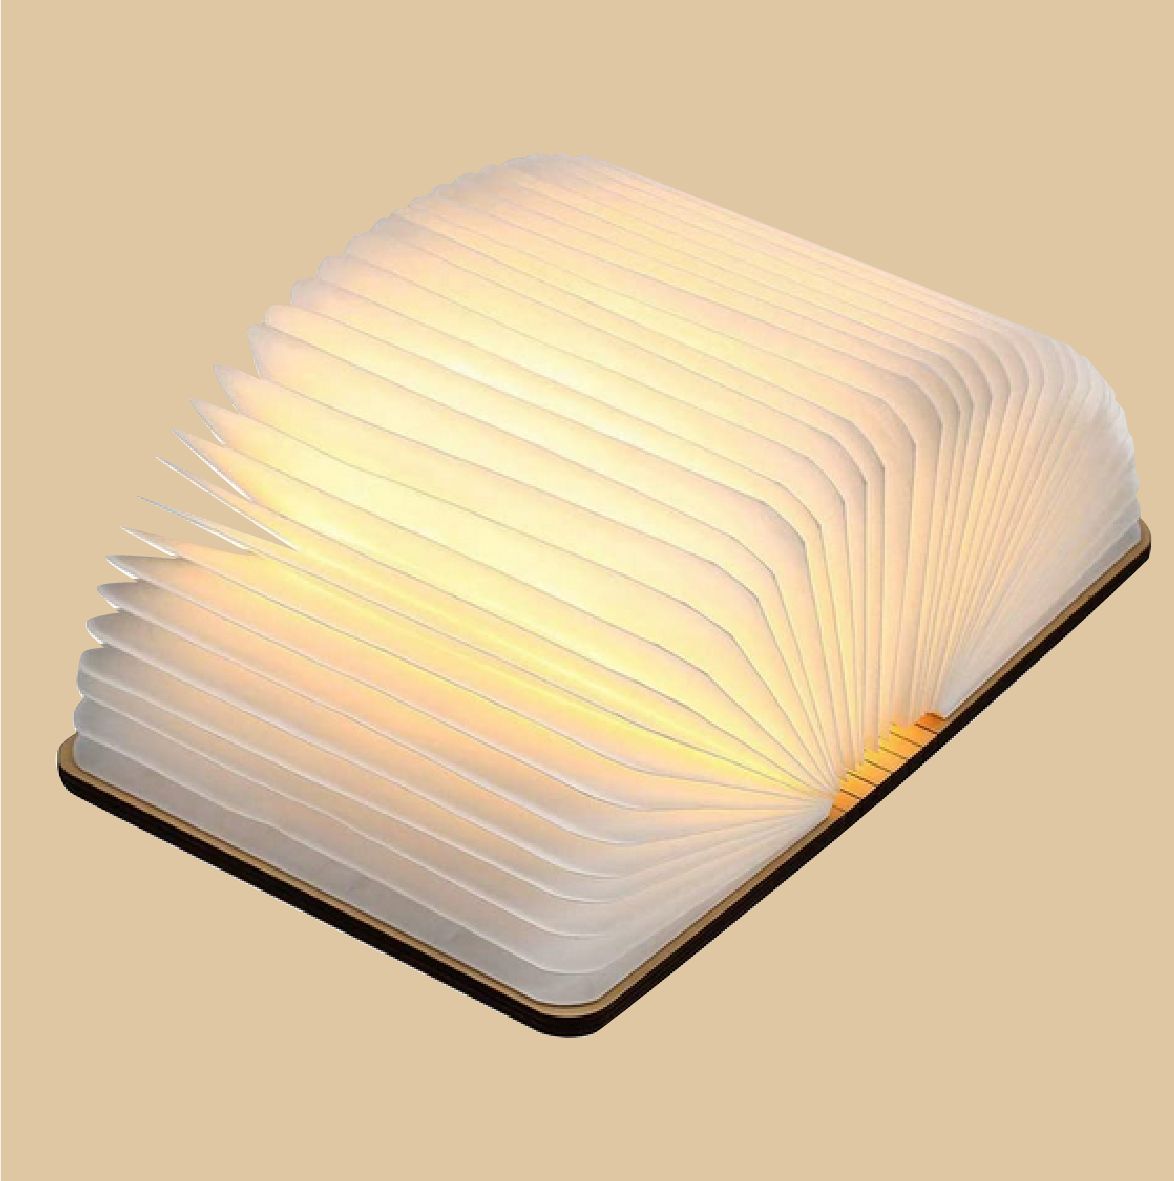 Book light category